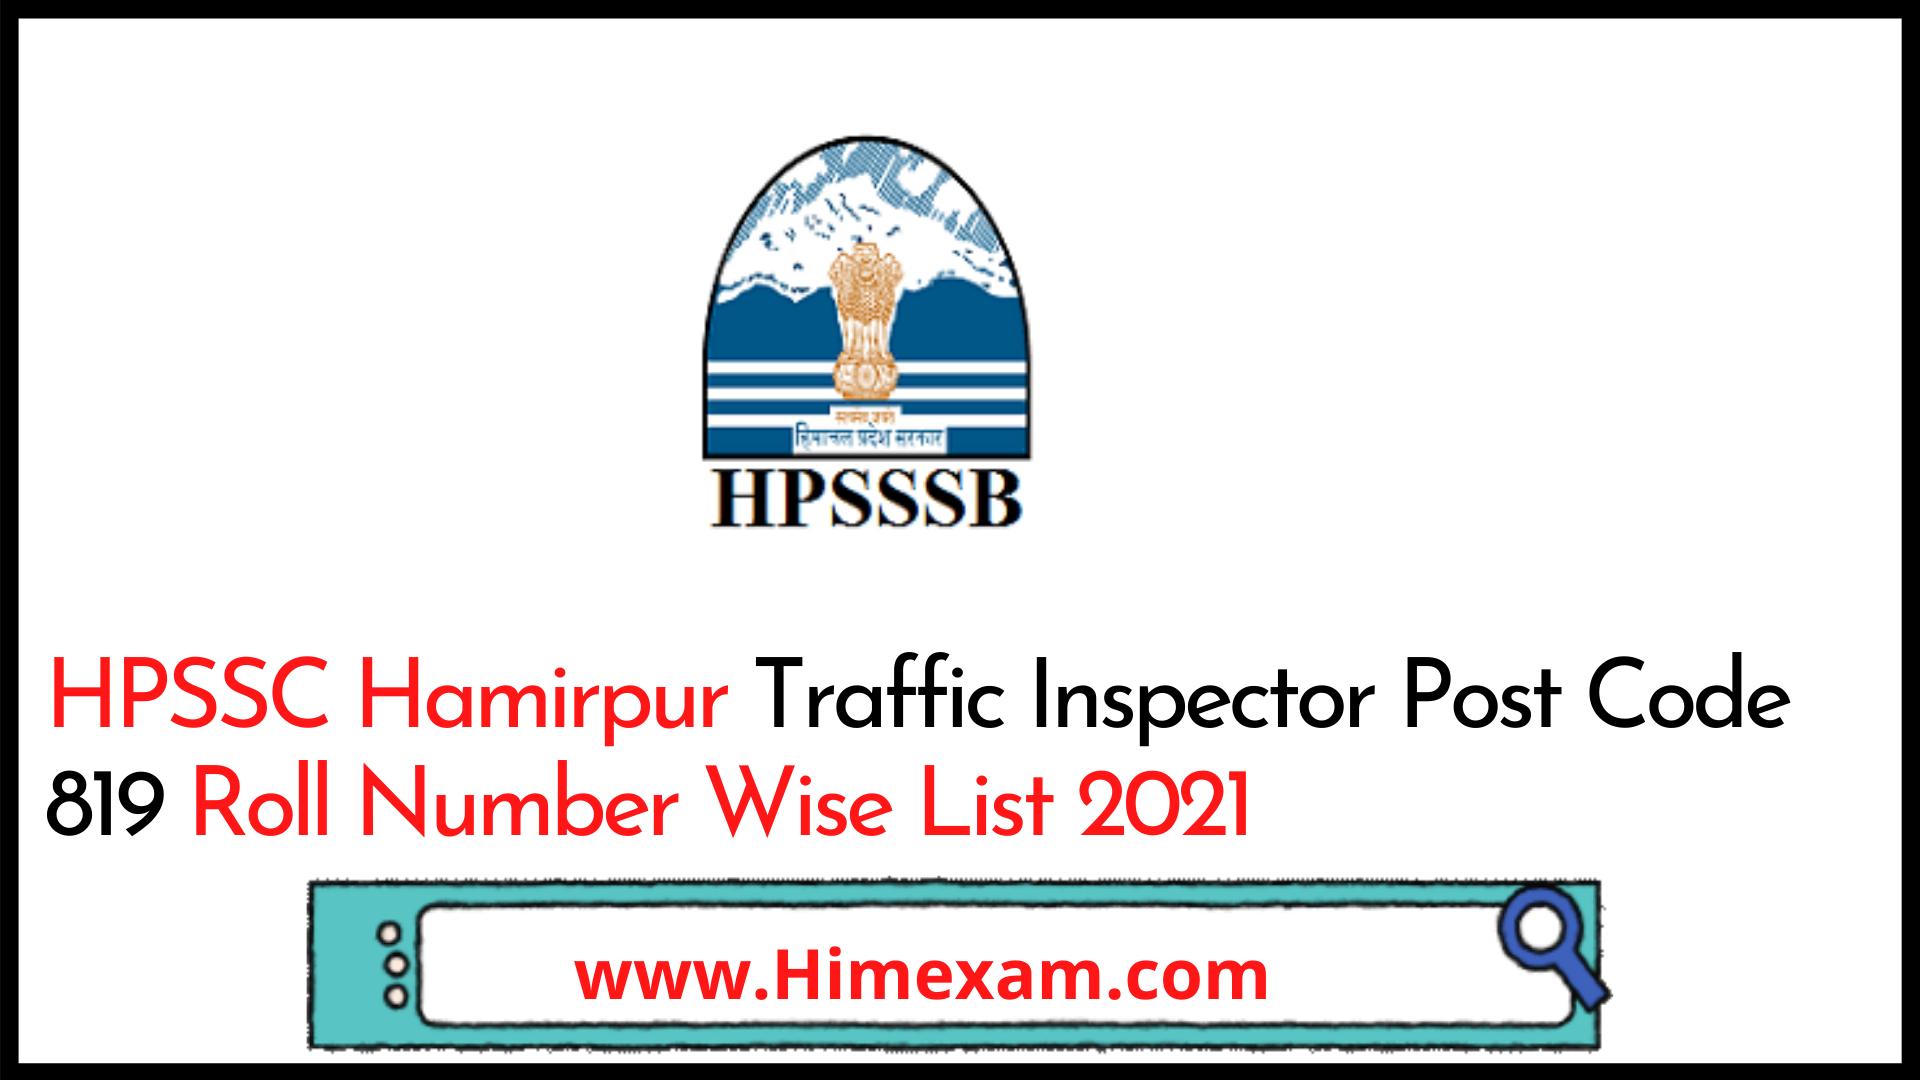 HPSSC Hamirpur Traffic Inspector Post Code 819 Roll Number Wise List 2021